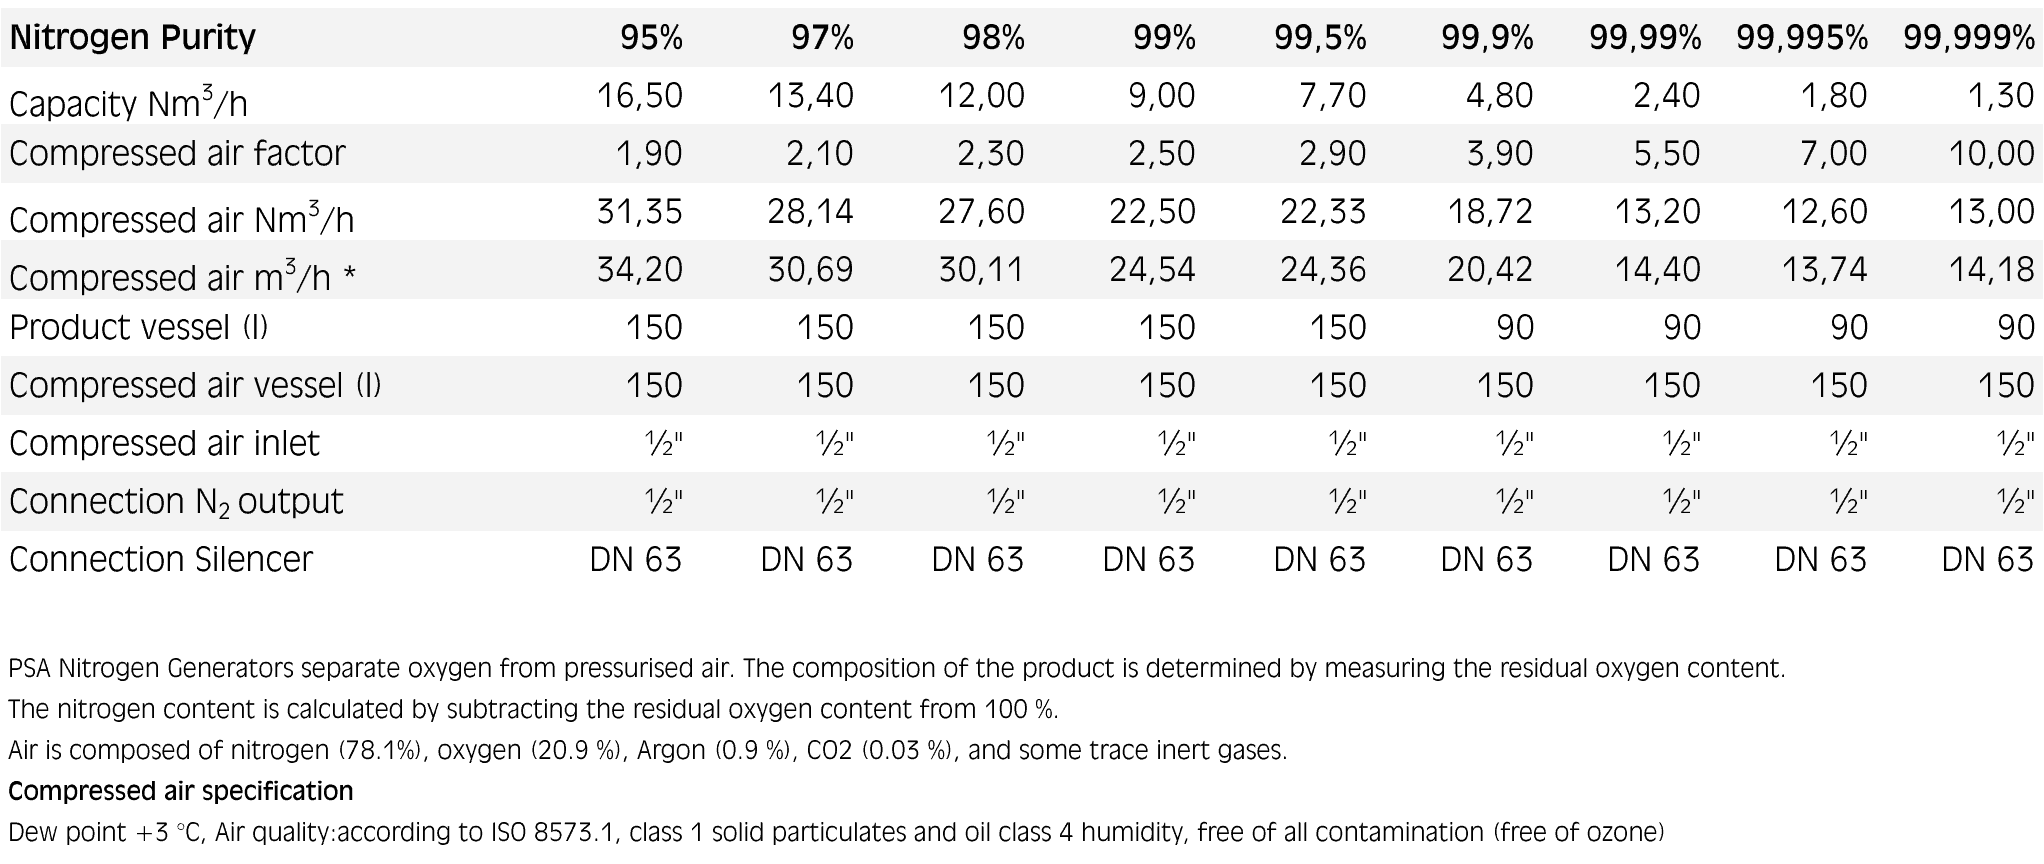 NIG PNOG 1280 parameters tab - NIG-PNOG-1280 PN OnGo Nitrogen Generator 1.3 - 16.5 m3 N2 per hour - nig